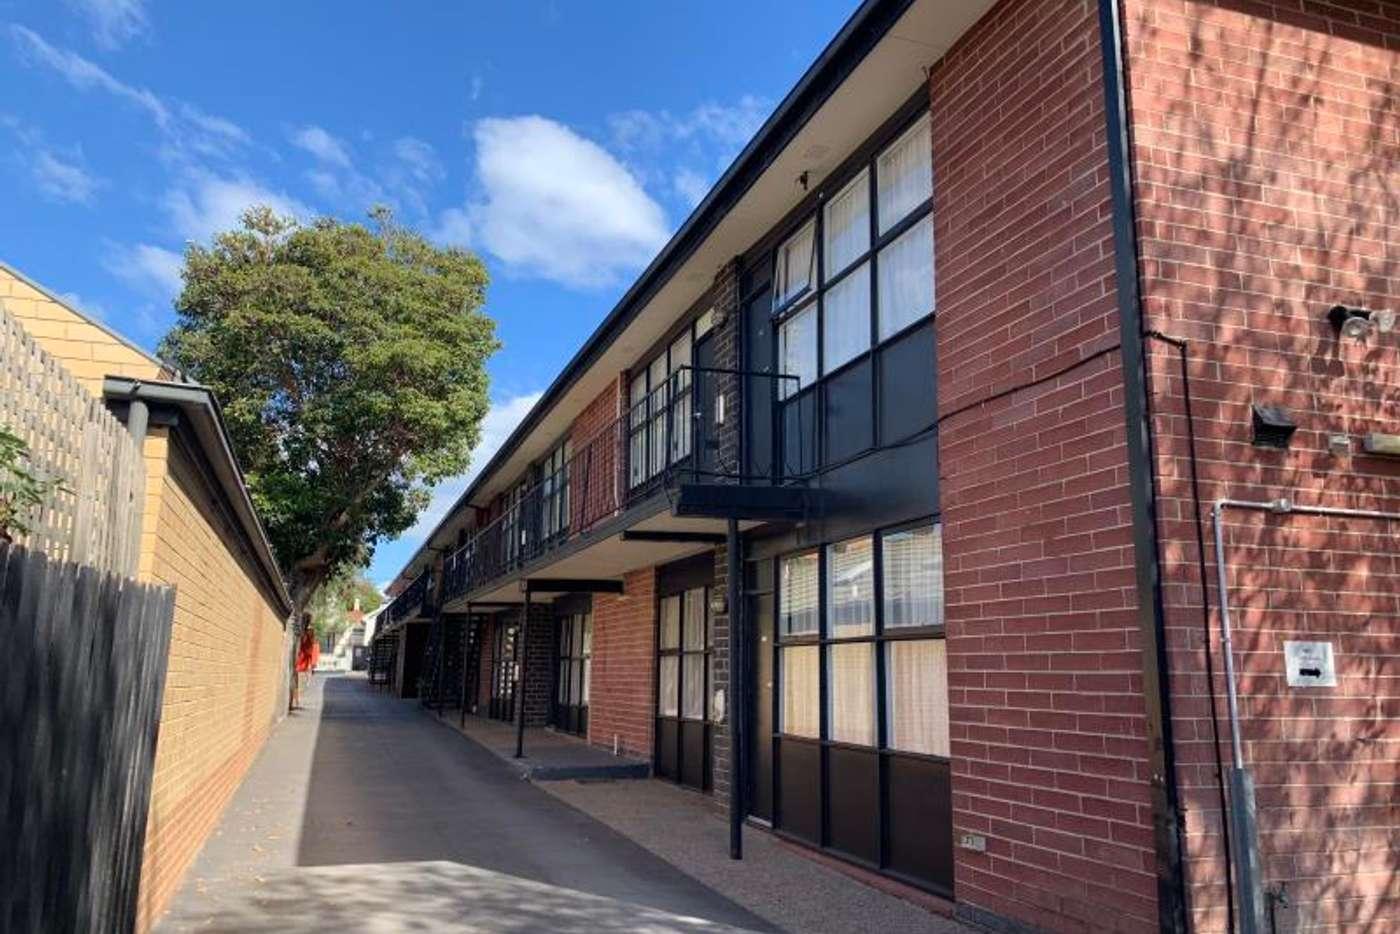 Main view of Homely apartment listing, 507/62 Carlisle Street, St Kilda VIC 3182